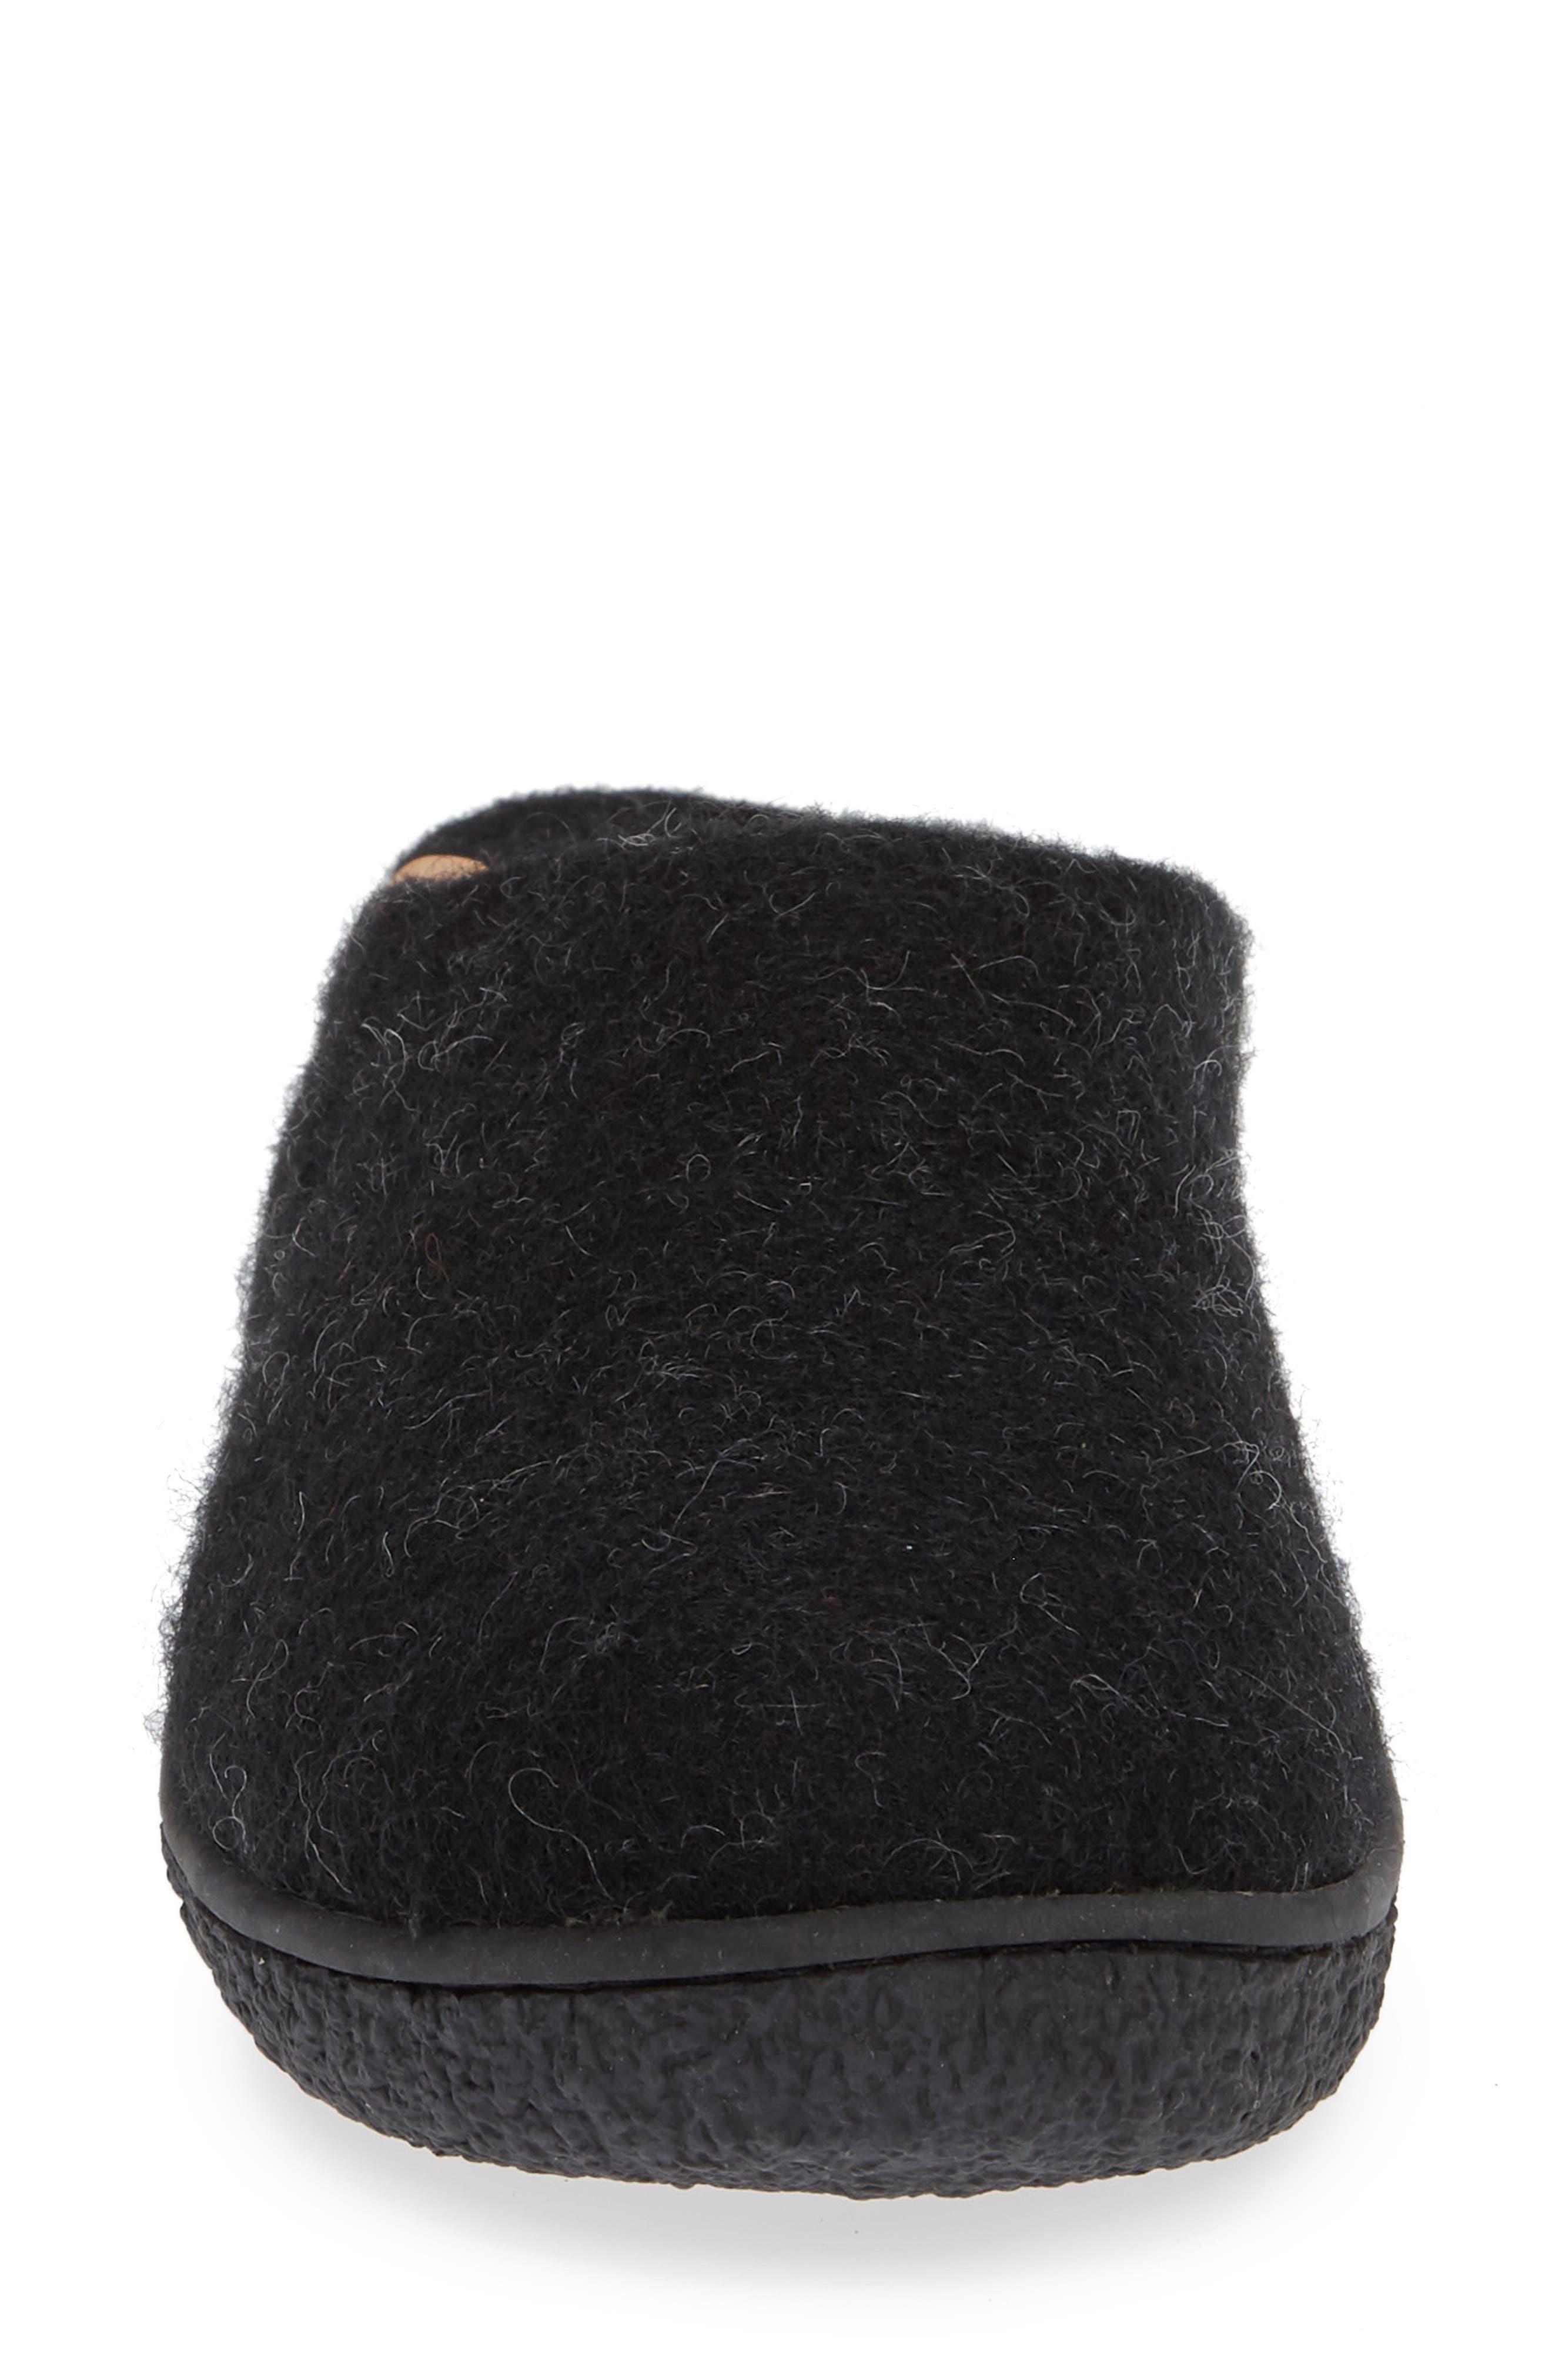 Tibet Wool Slipper,                             Alternate thumbnail 4, color,                             BLACK WOOL